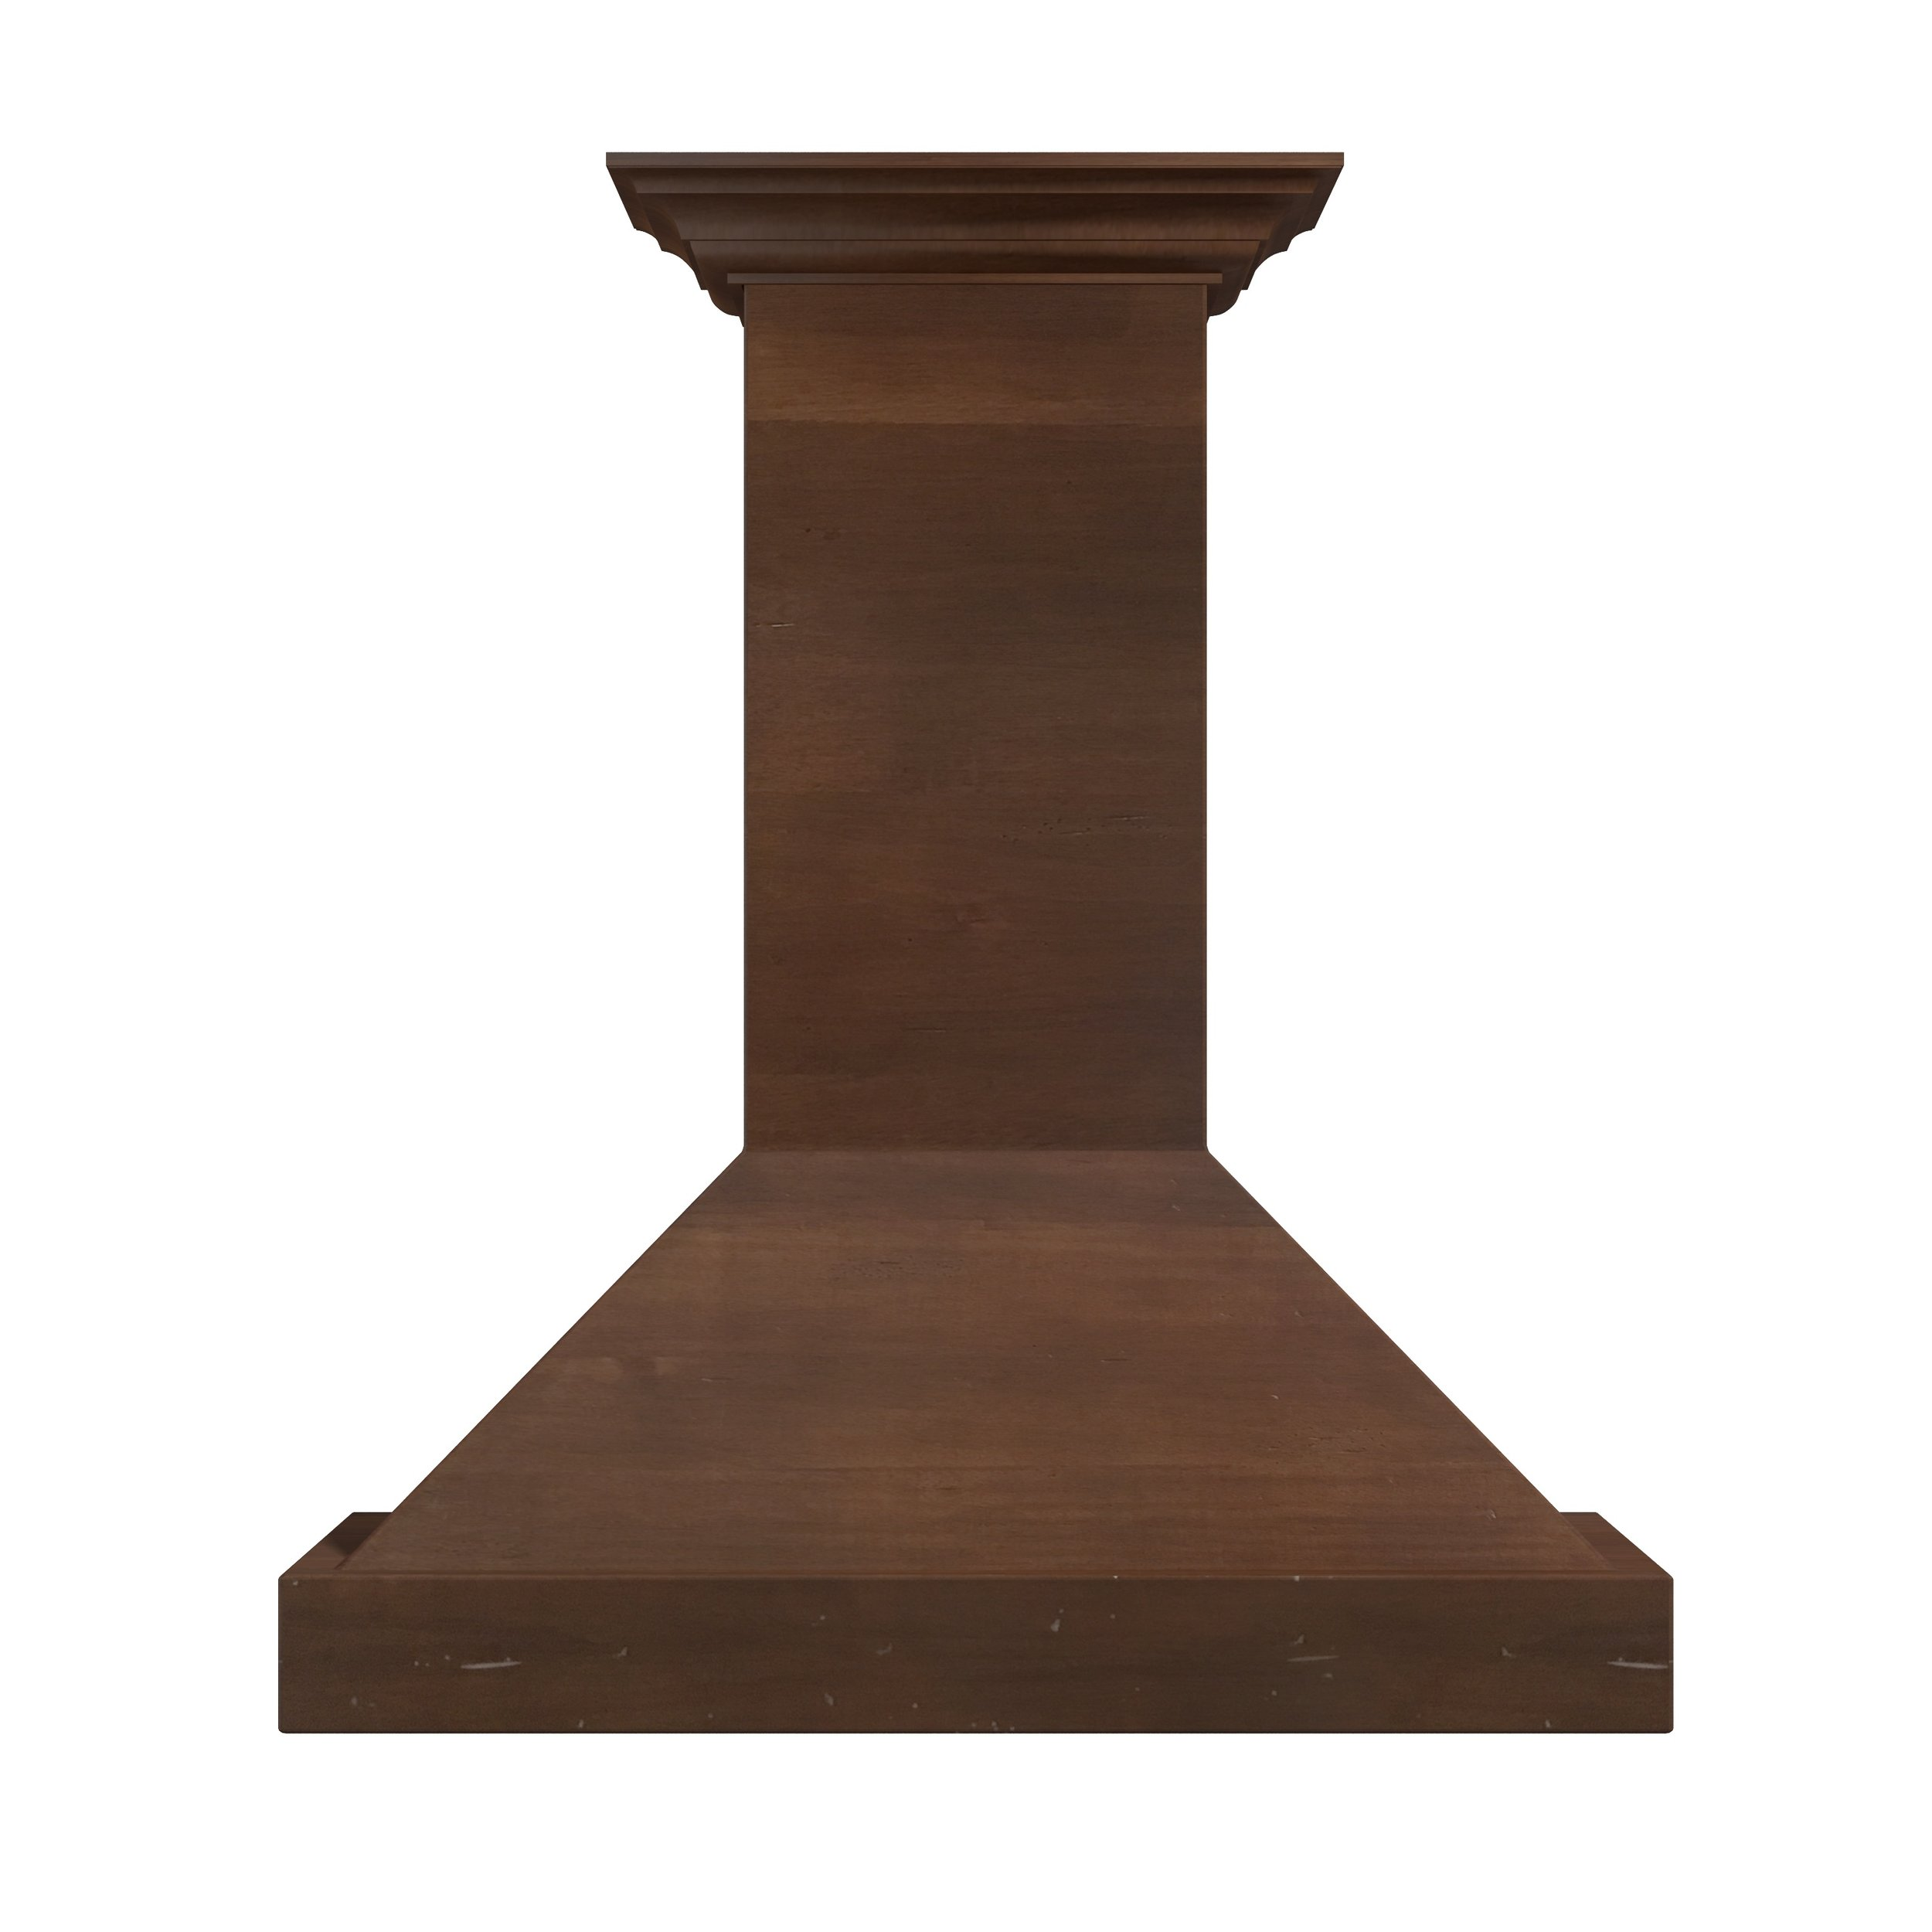 zline-designer-wood-range-hood-KBRR-front.jpg